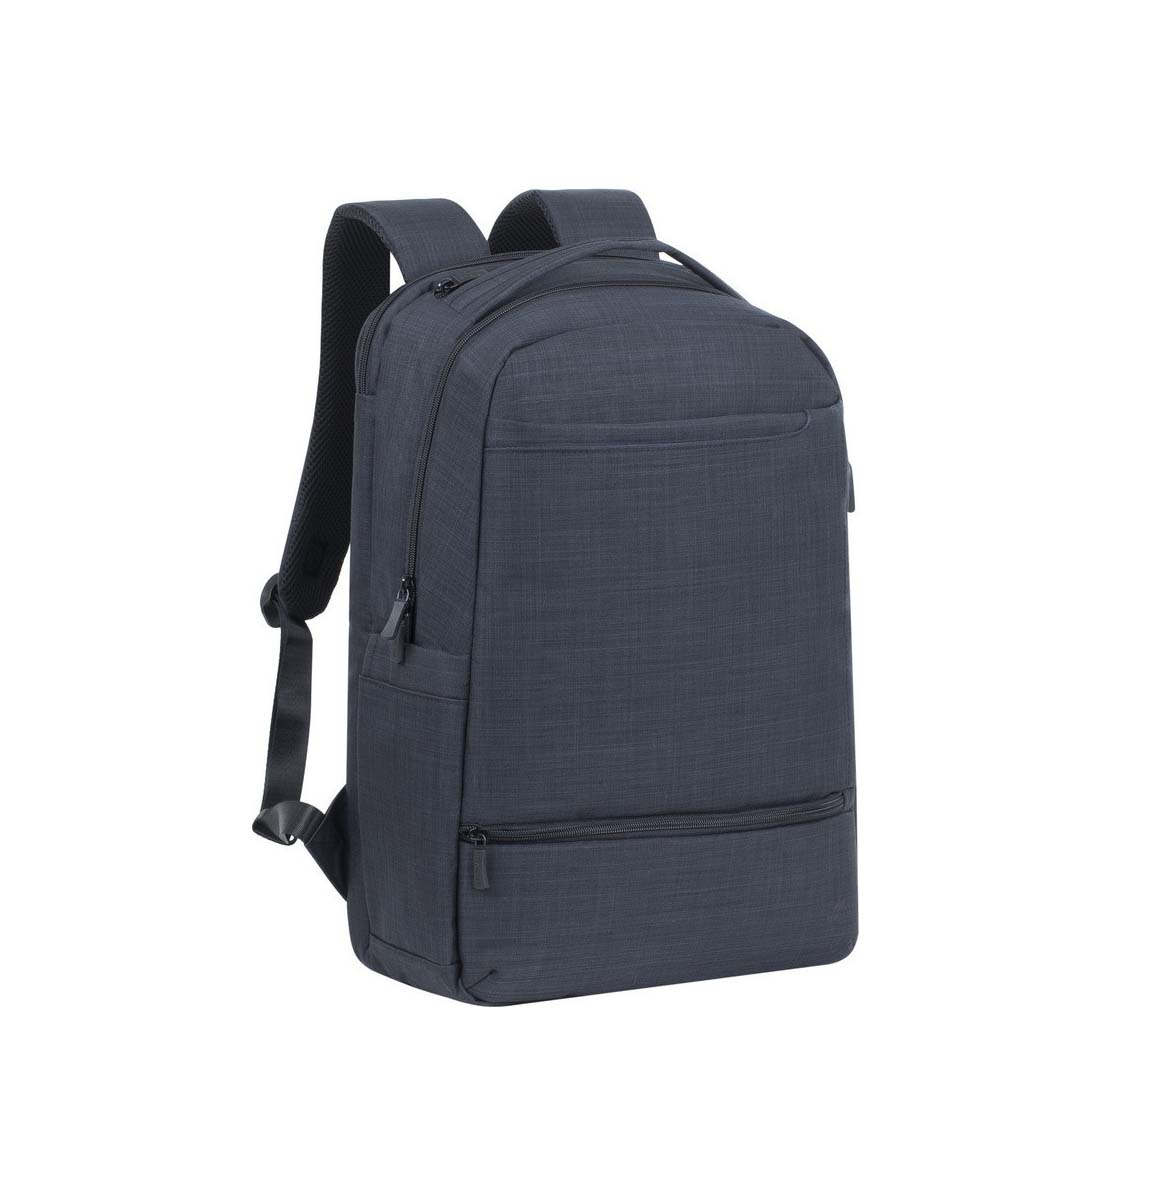 "Rivacase Biscayne 8365 Τσάντα Πλάτης για Laptop 17.3"" Black"